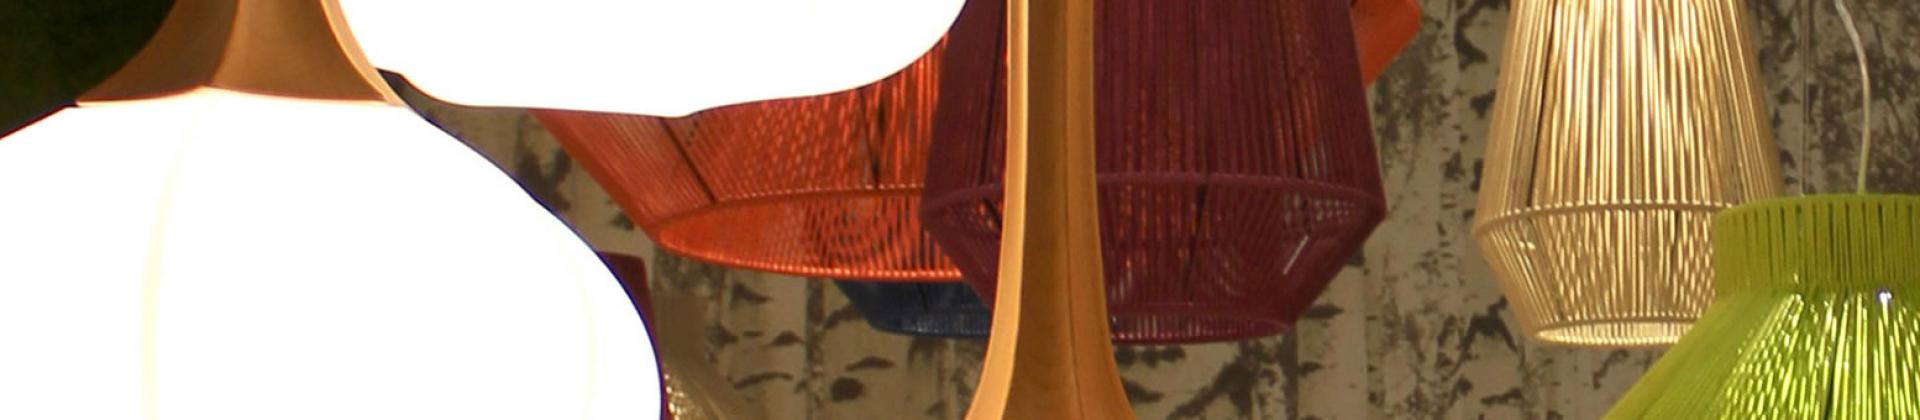 El Torrent Lámparas Colgantes - Lámparas de diseño